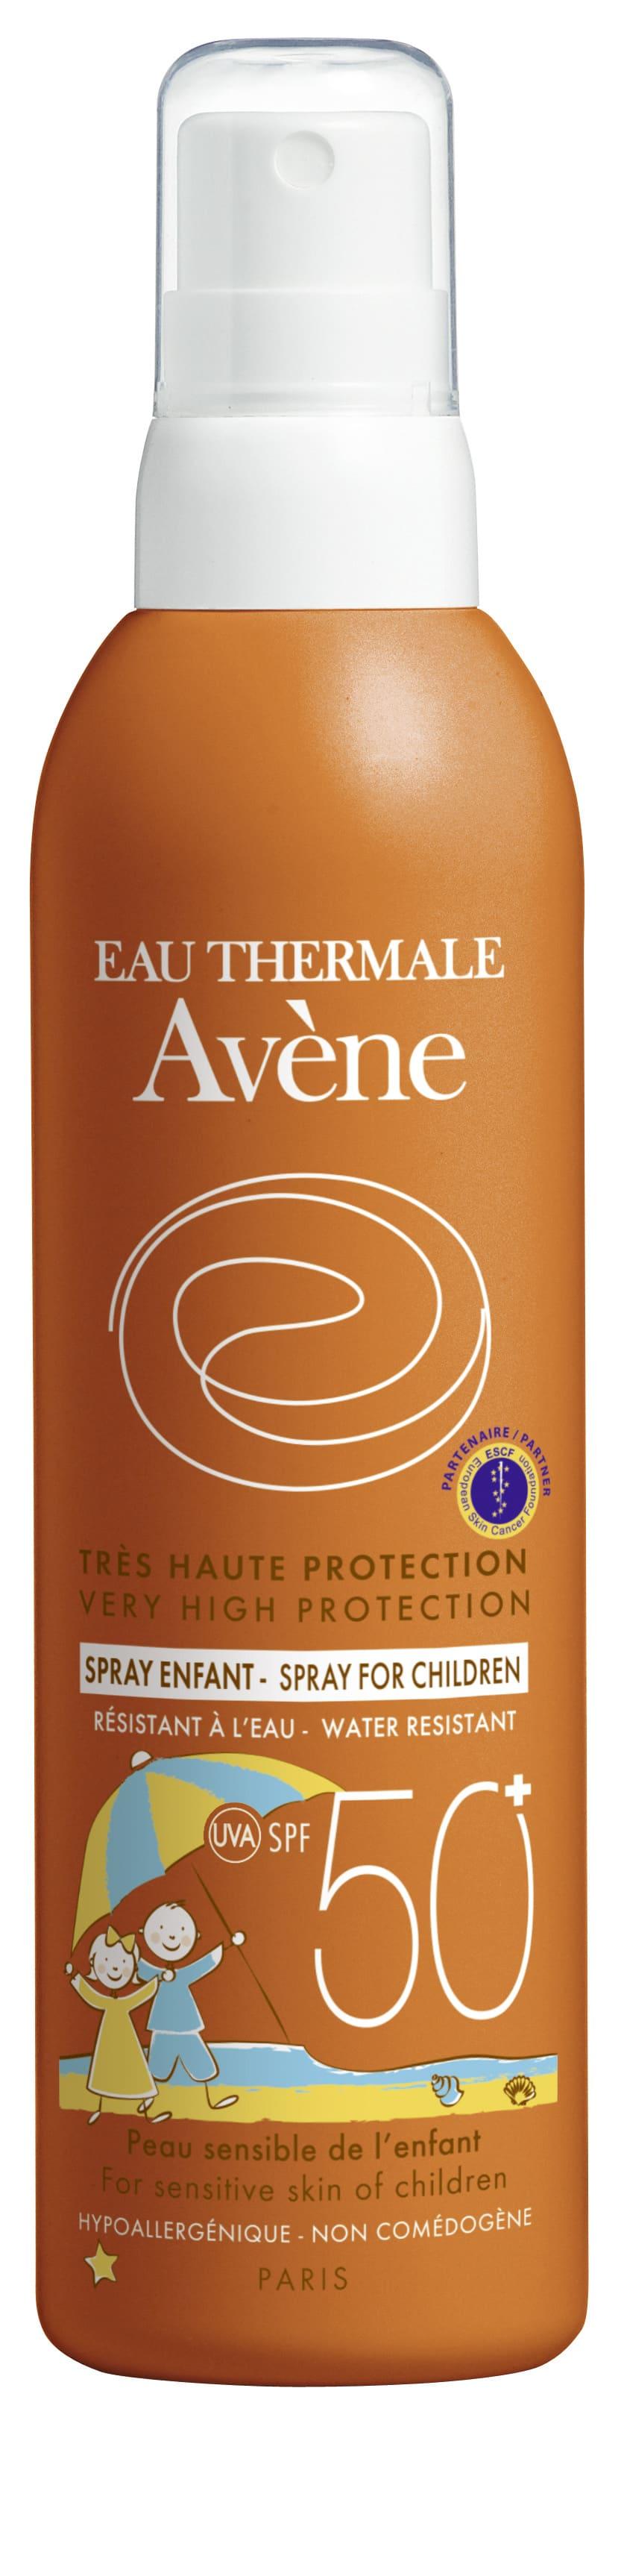 Avene Eau Thermale Spray Enfant SPF50+ Αντιηλιακό παιδικό Σπρέι για Παιδιά, 200ml